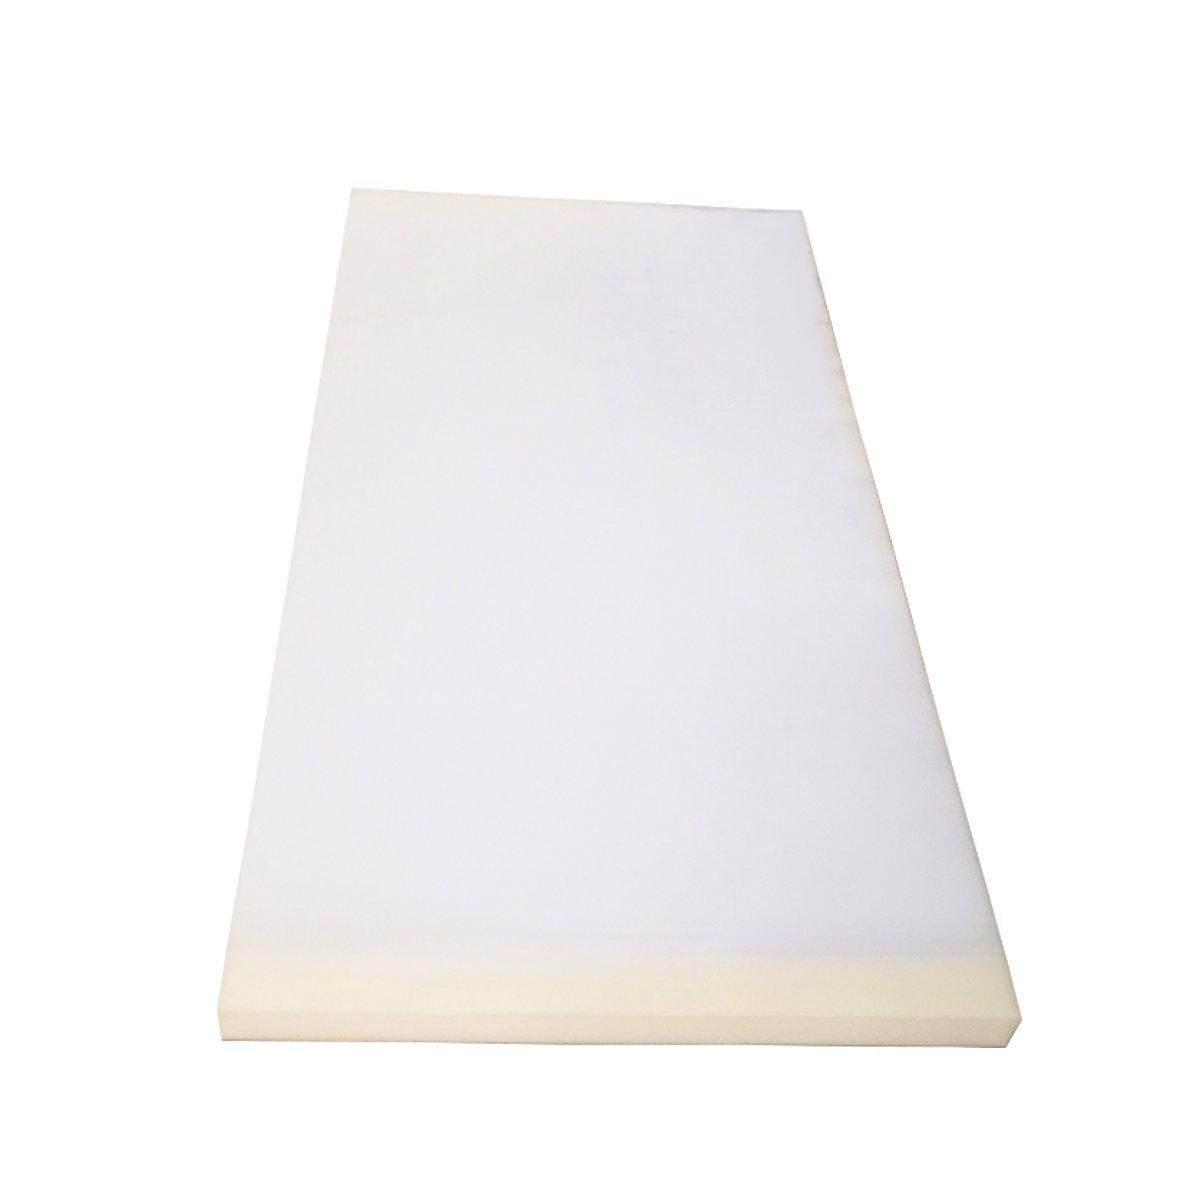 High Density Seat Foam Cushion Replacement Upholstery Foam Per Sheet 16x 30  2.5cm By Ferry.